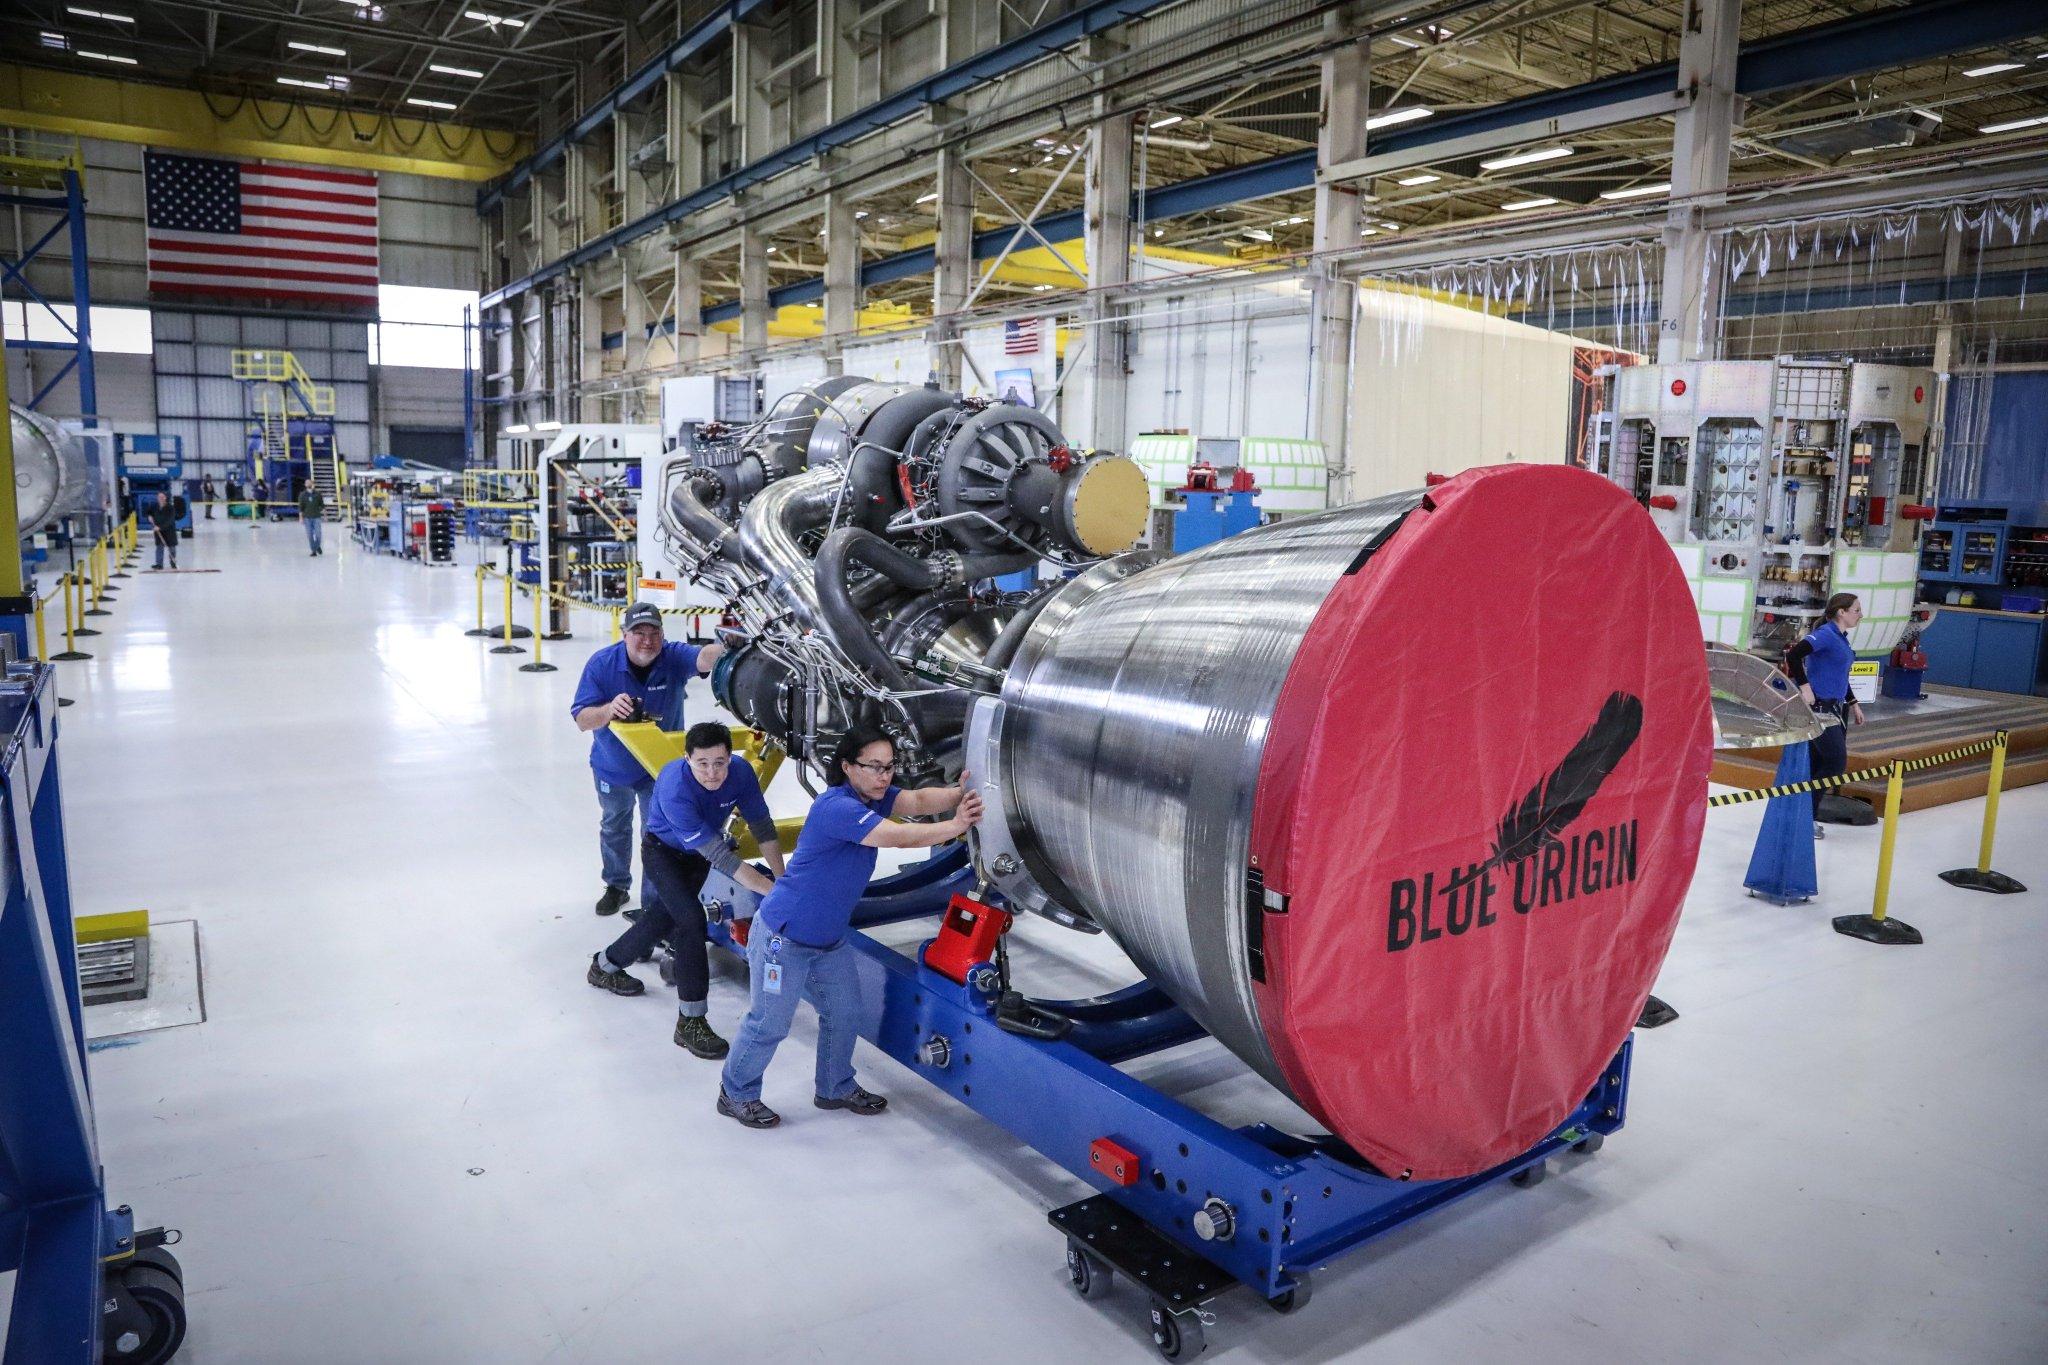 AR1's competition, the BE-4 rocket engine developed by Blue Origin. Photo via Jeff Bezos/Blue Origin.